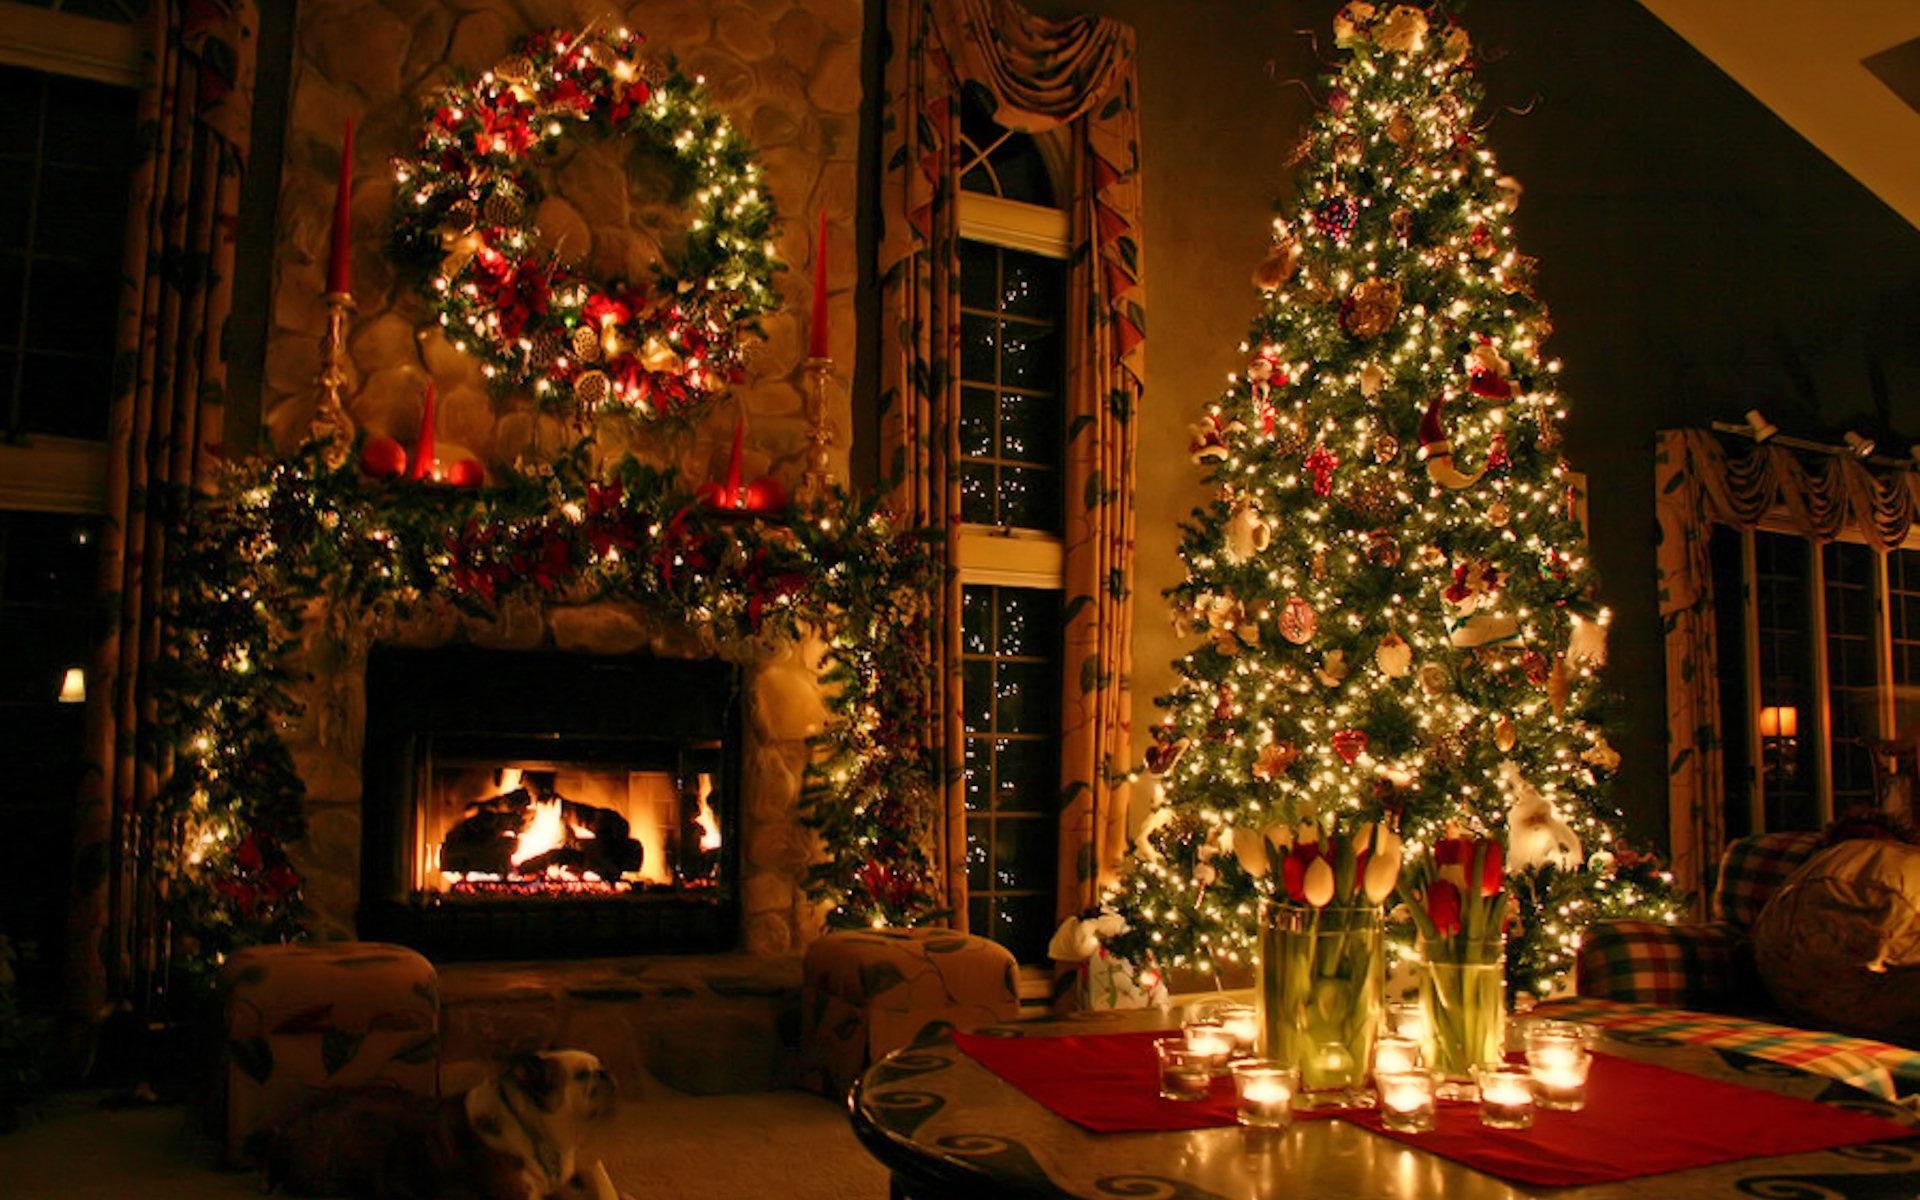 21 Stunningly Beautiful Christmas Desktop Wallpapers Web Design Mash 1920x1200